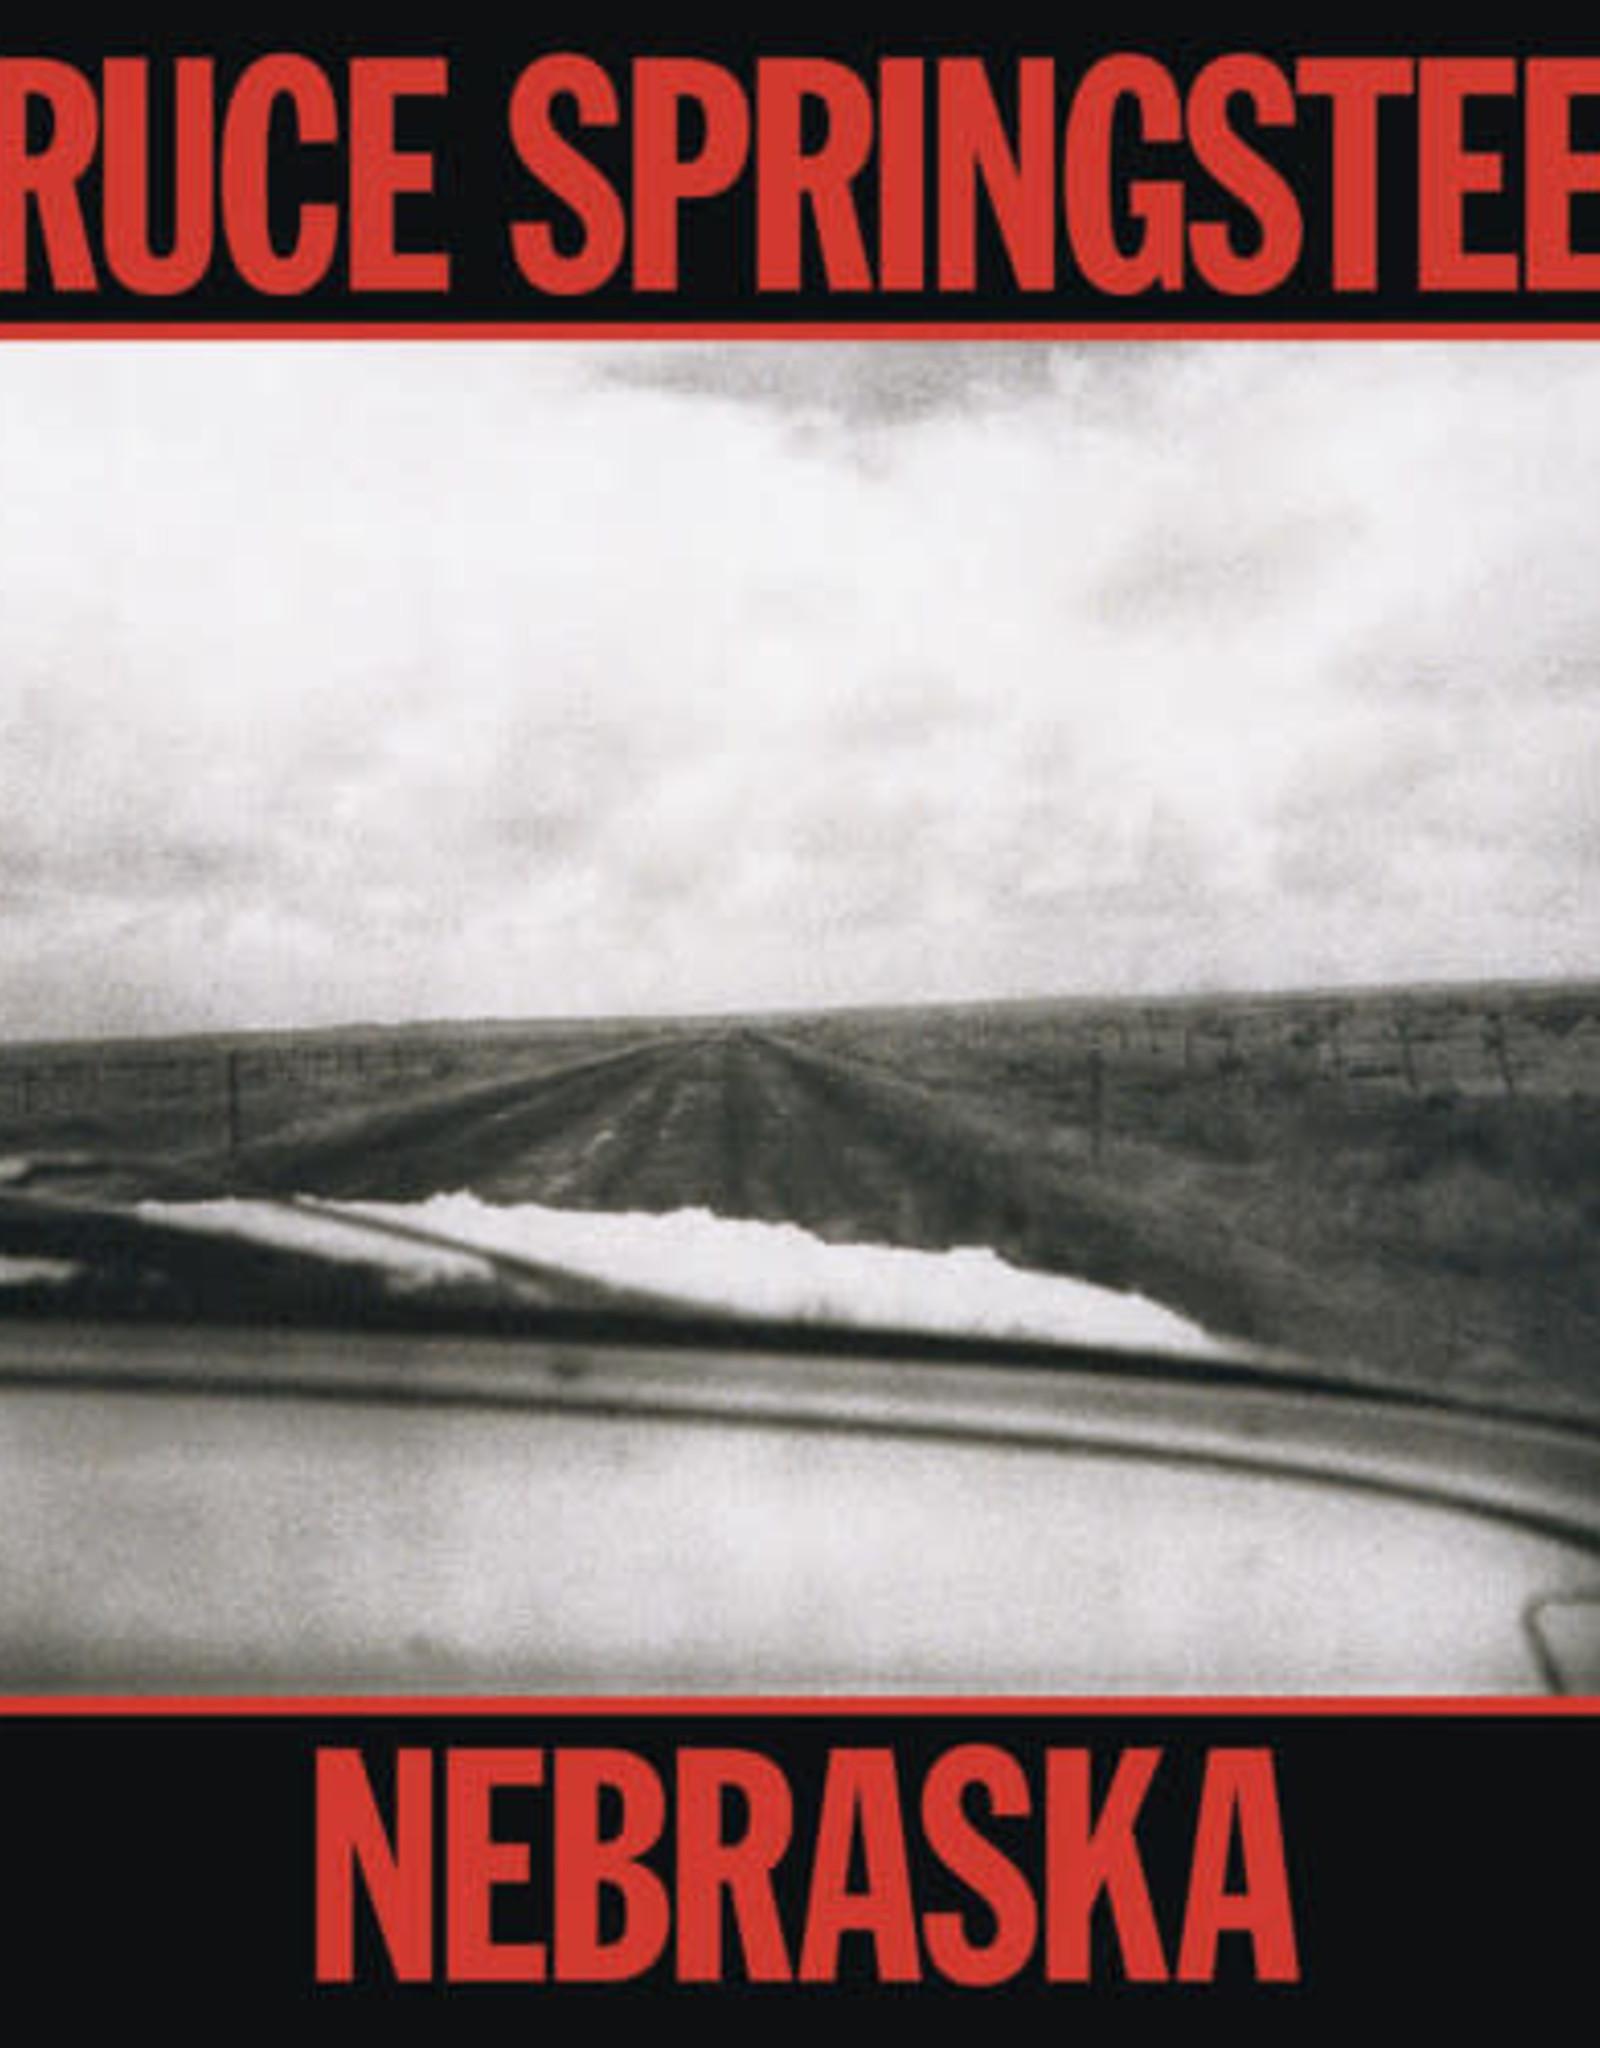 Bruce Springsteen - Nebraska (180 Gram)